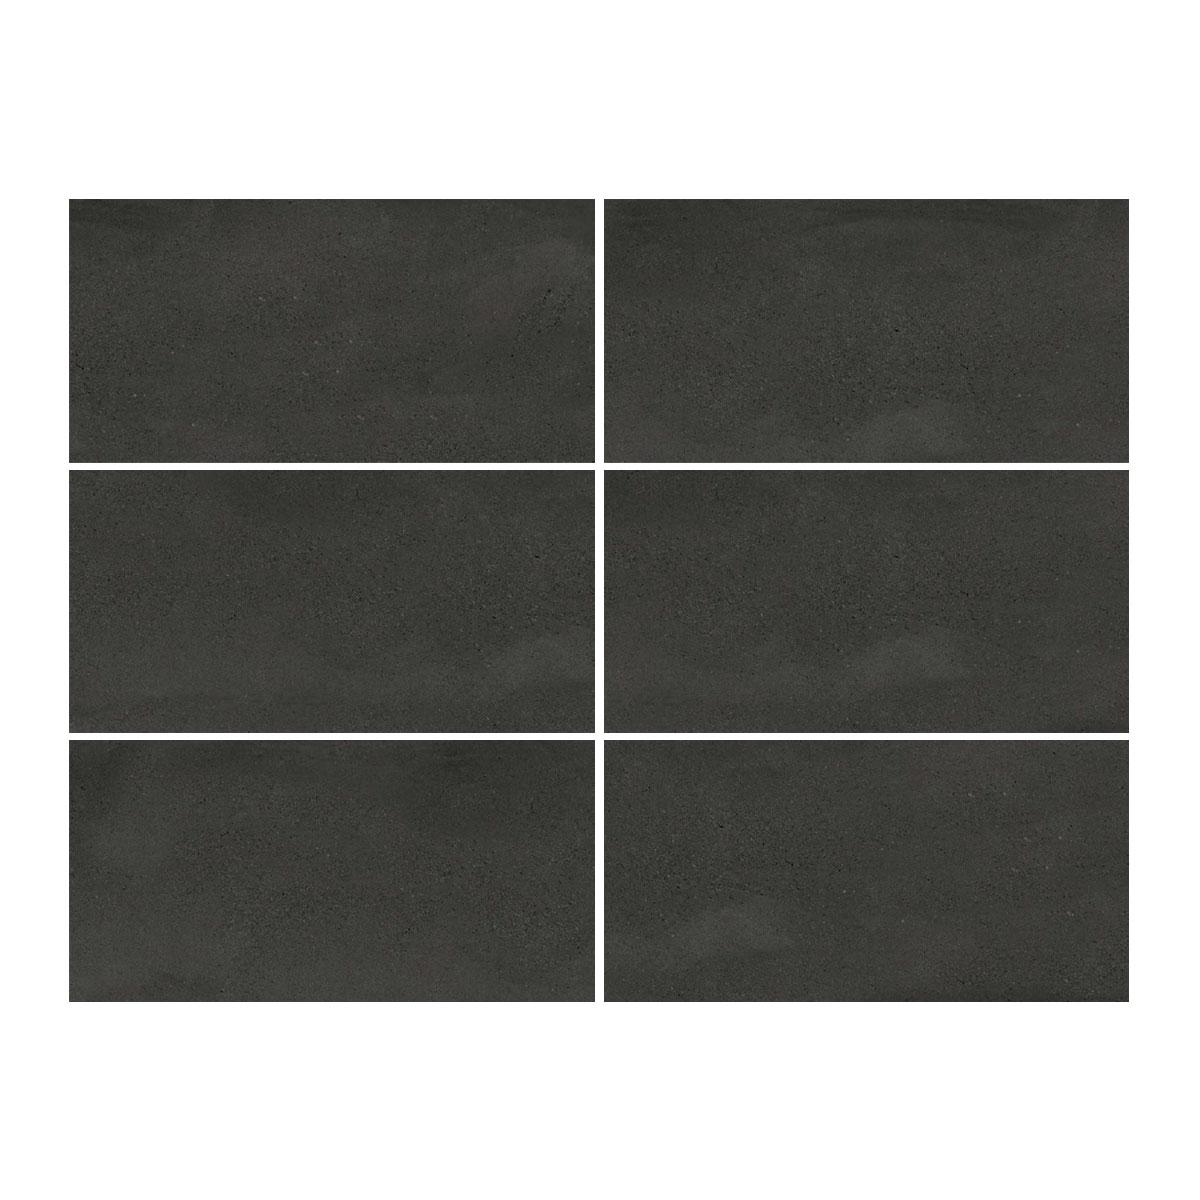 Moonstone - Midnight - Concrete Look Tiles - 300x600mm - Stone3